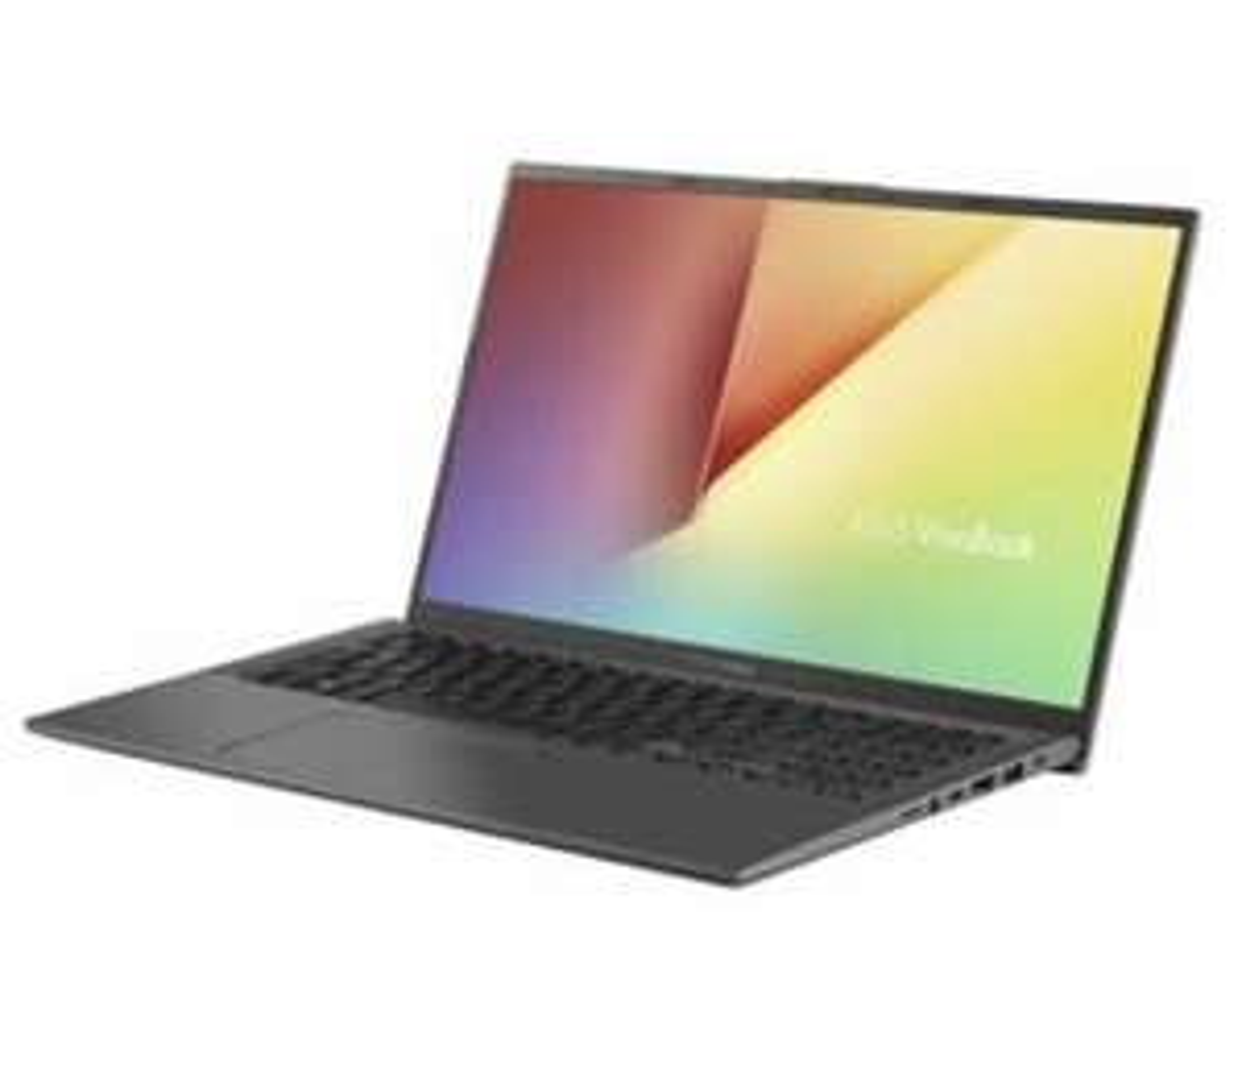 ASUS VivoBook 15 X512UA Laptop, Intel Pentium 4415 2.3GHz, 8GB RAM, 256GB SSD - £281.34 (With Code) @ Ebuyer Ebay